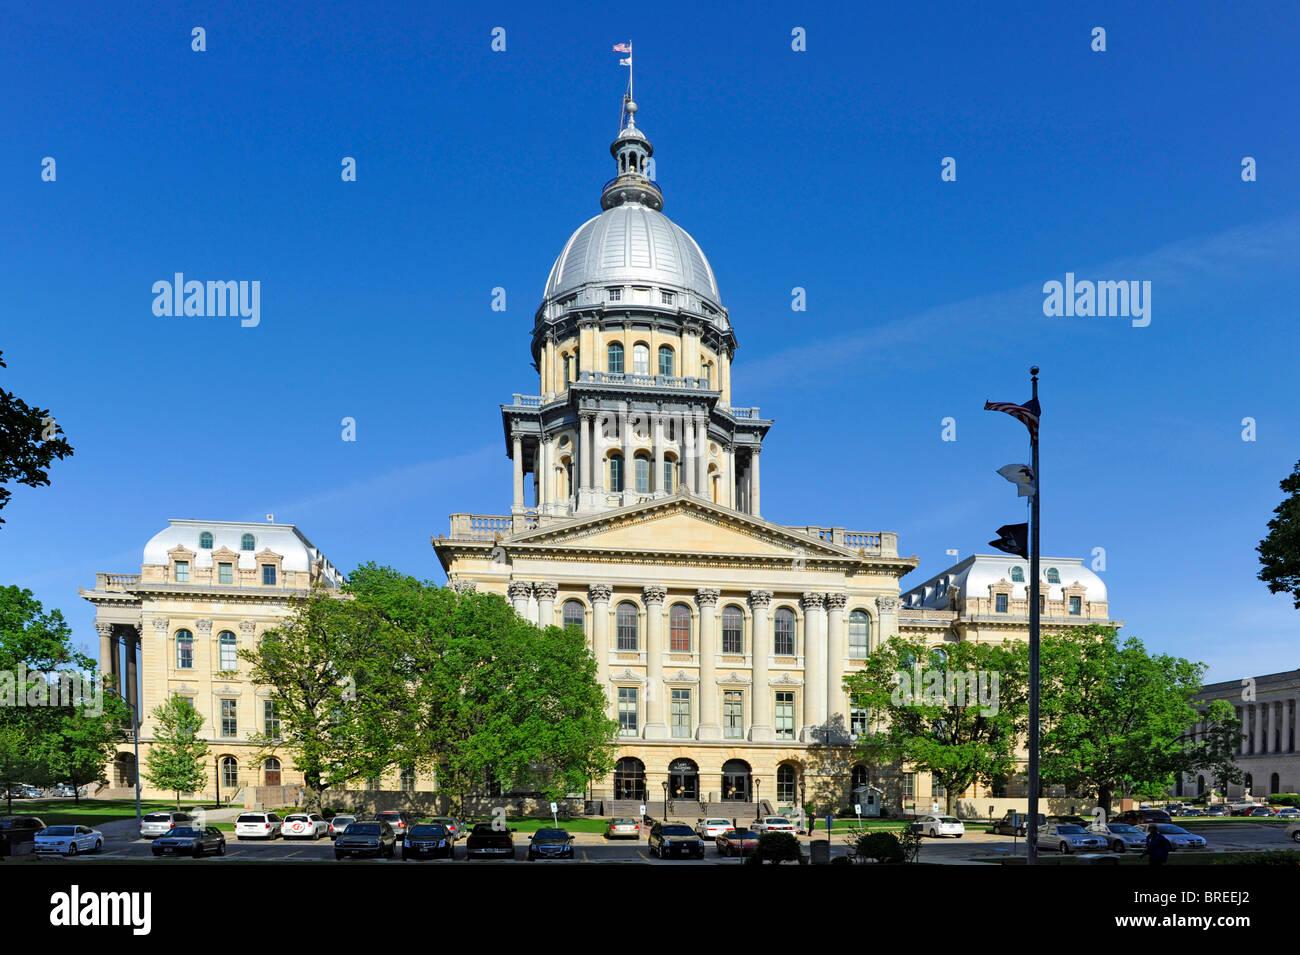 Illinois State Capitol Building Springfield Illinois - Stock Image